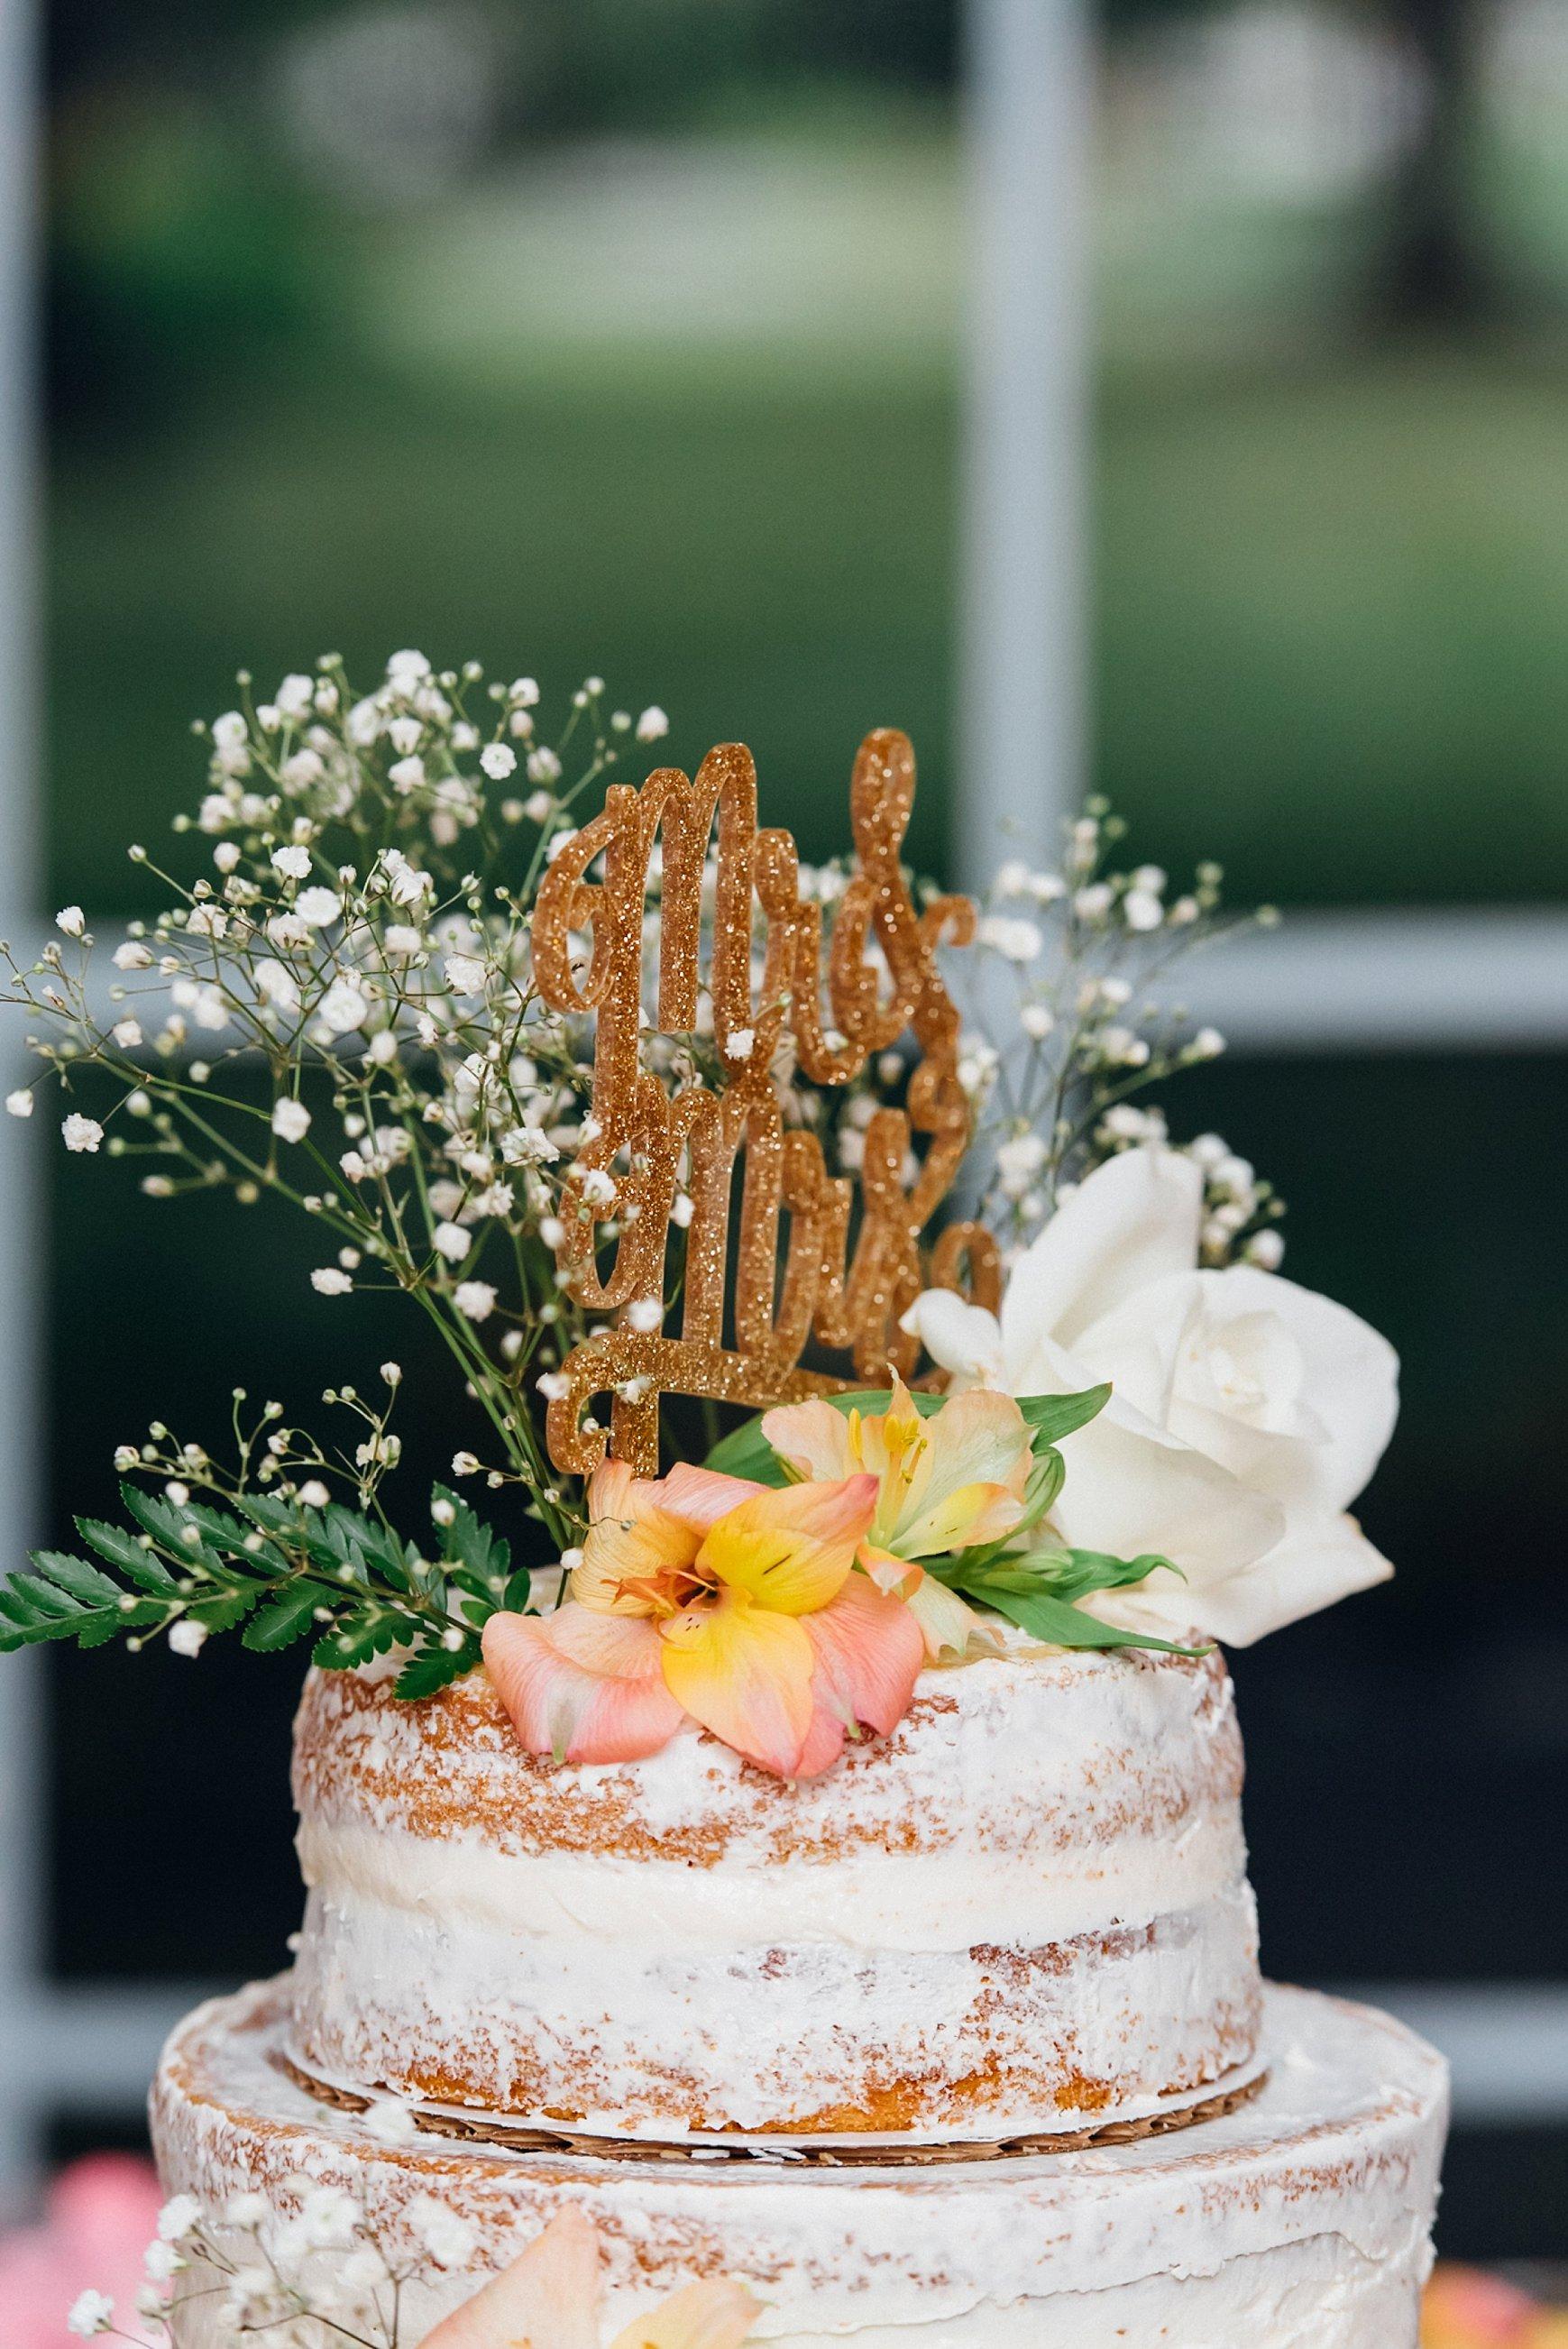 Ottawa Wedding Photographer - Stanley's Olde Maple Lane Barn Wedding - Ali & Batoul Photography_0065.jpg